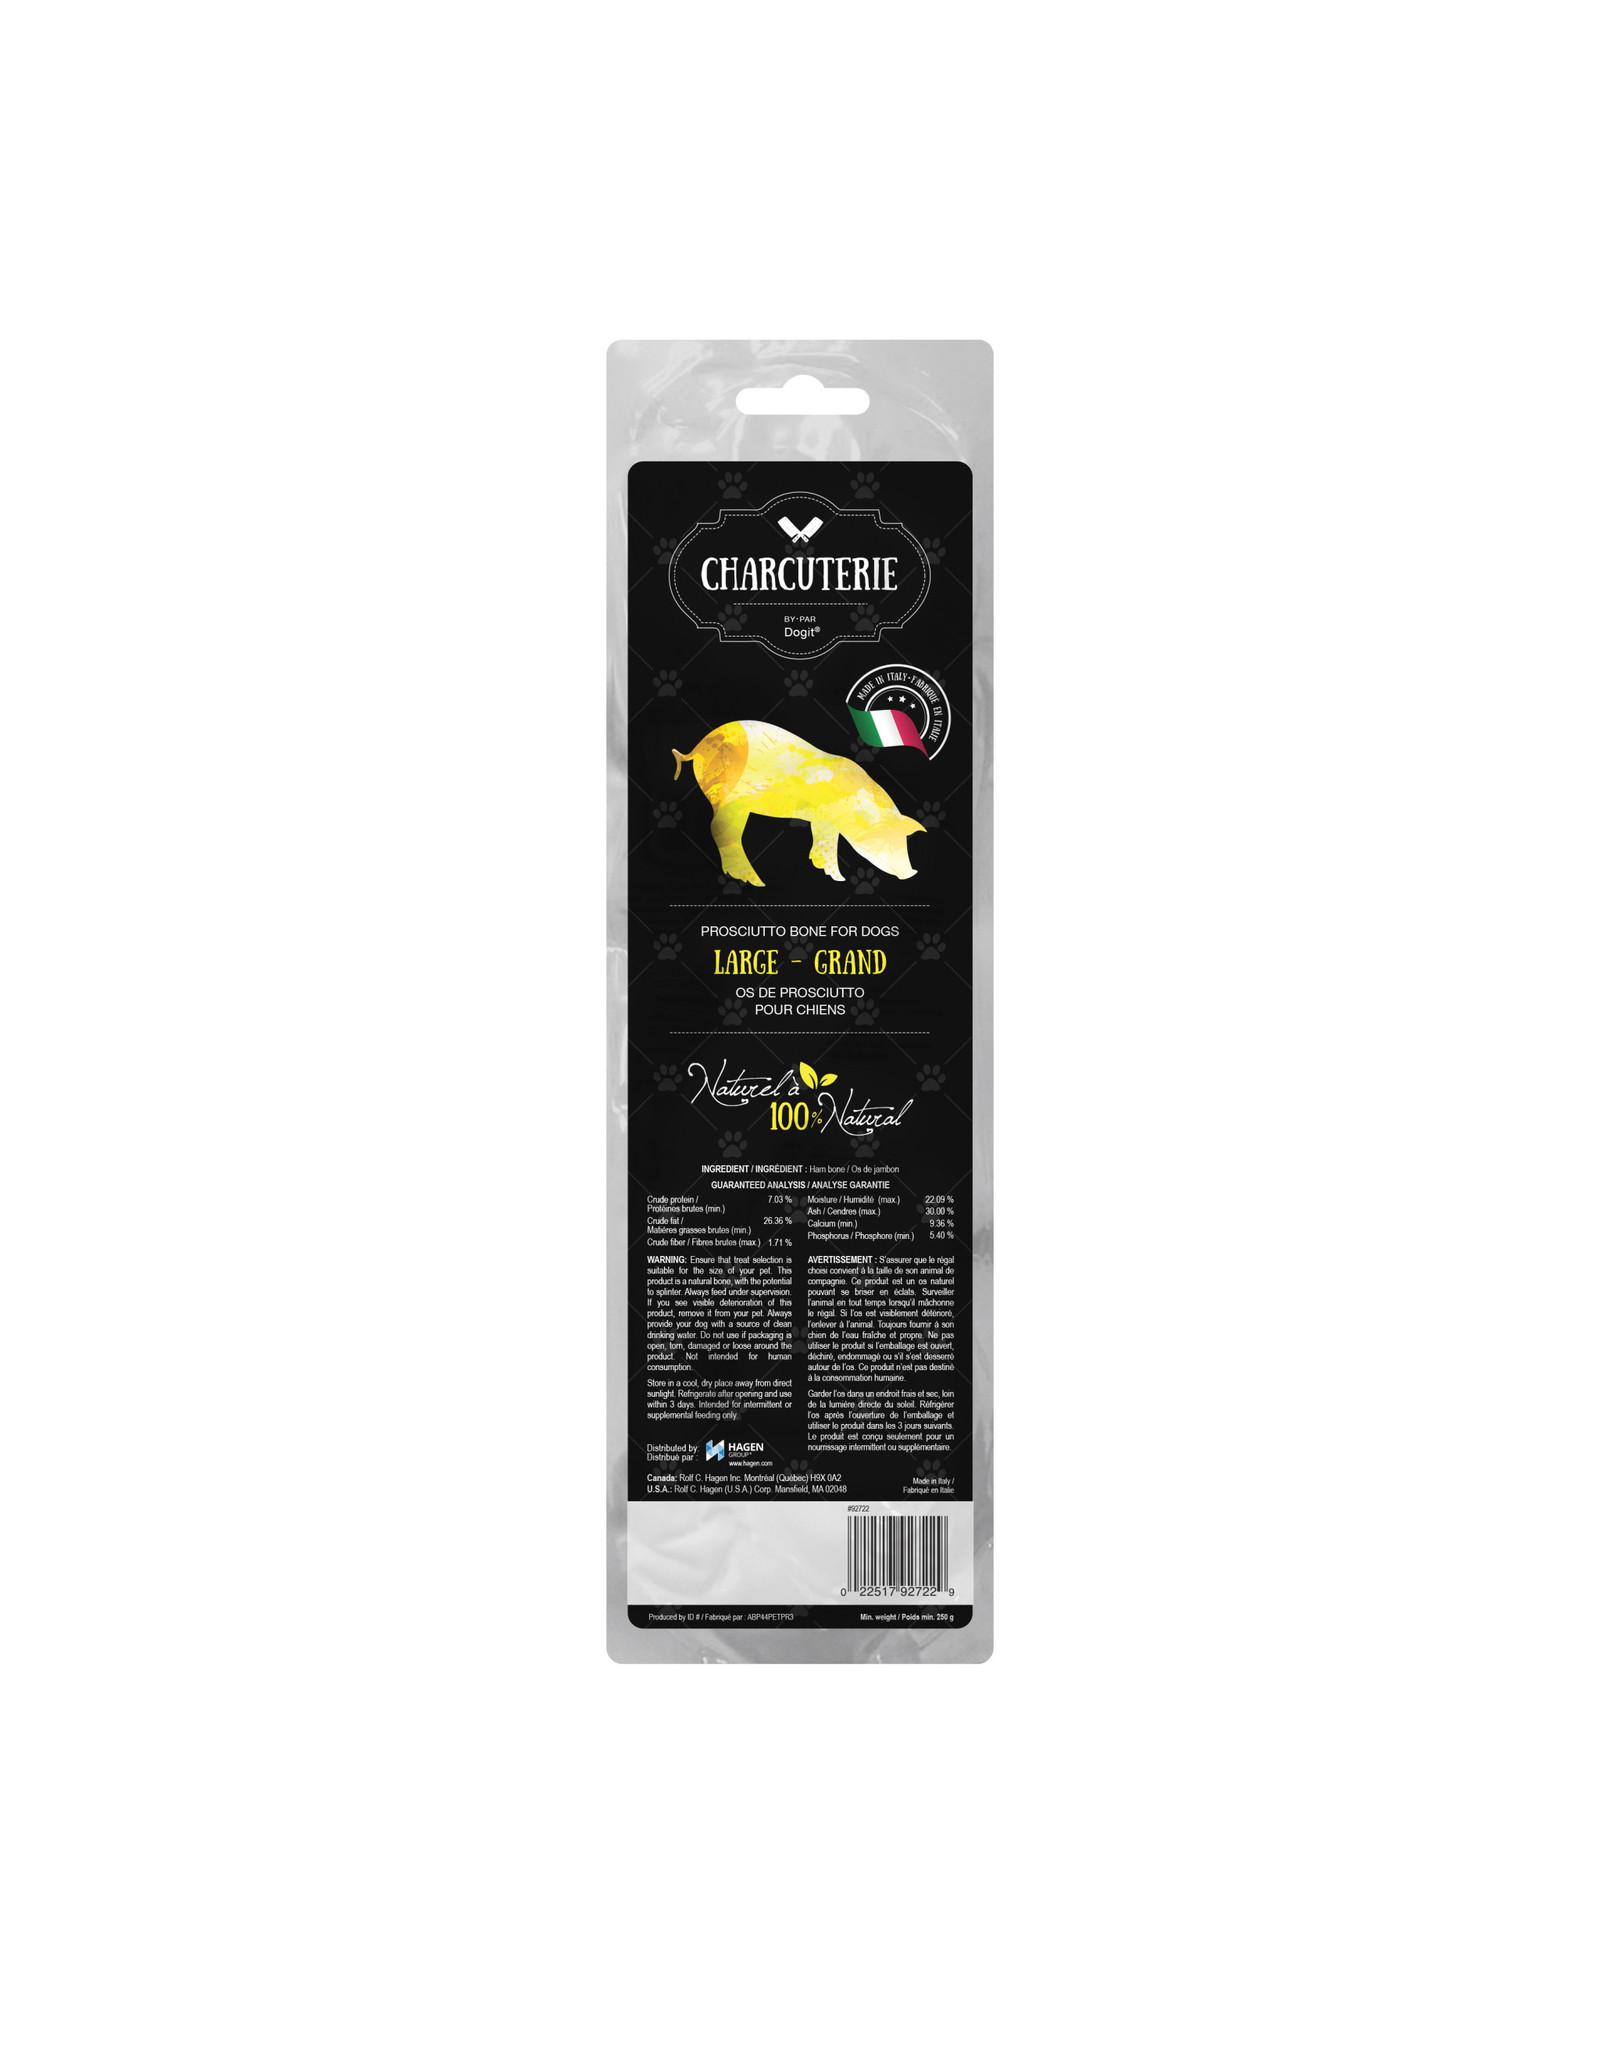 DogIt Prosciutto Bone for Dogs Large (Femur) 250g